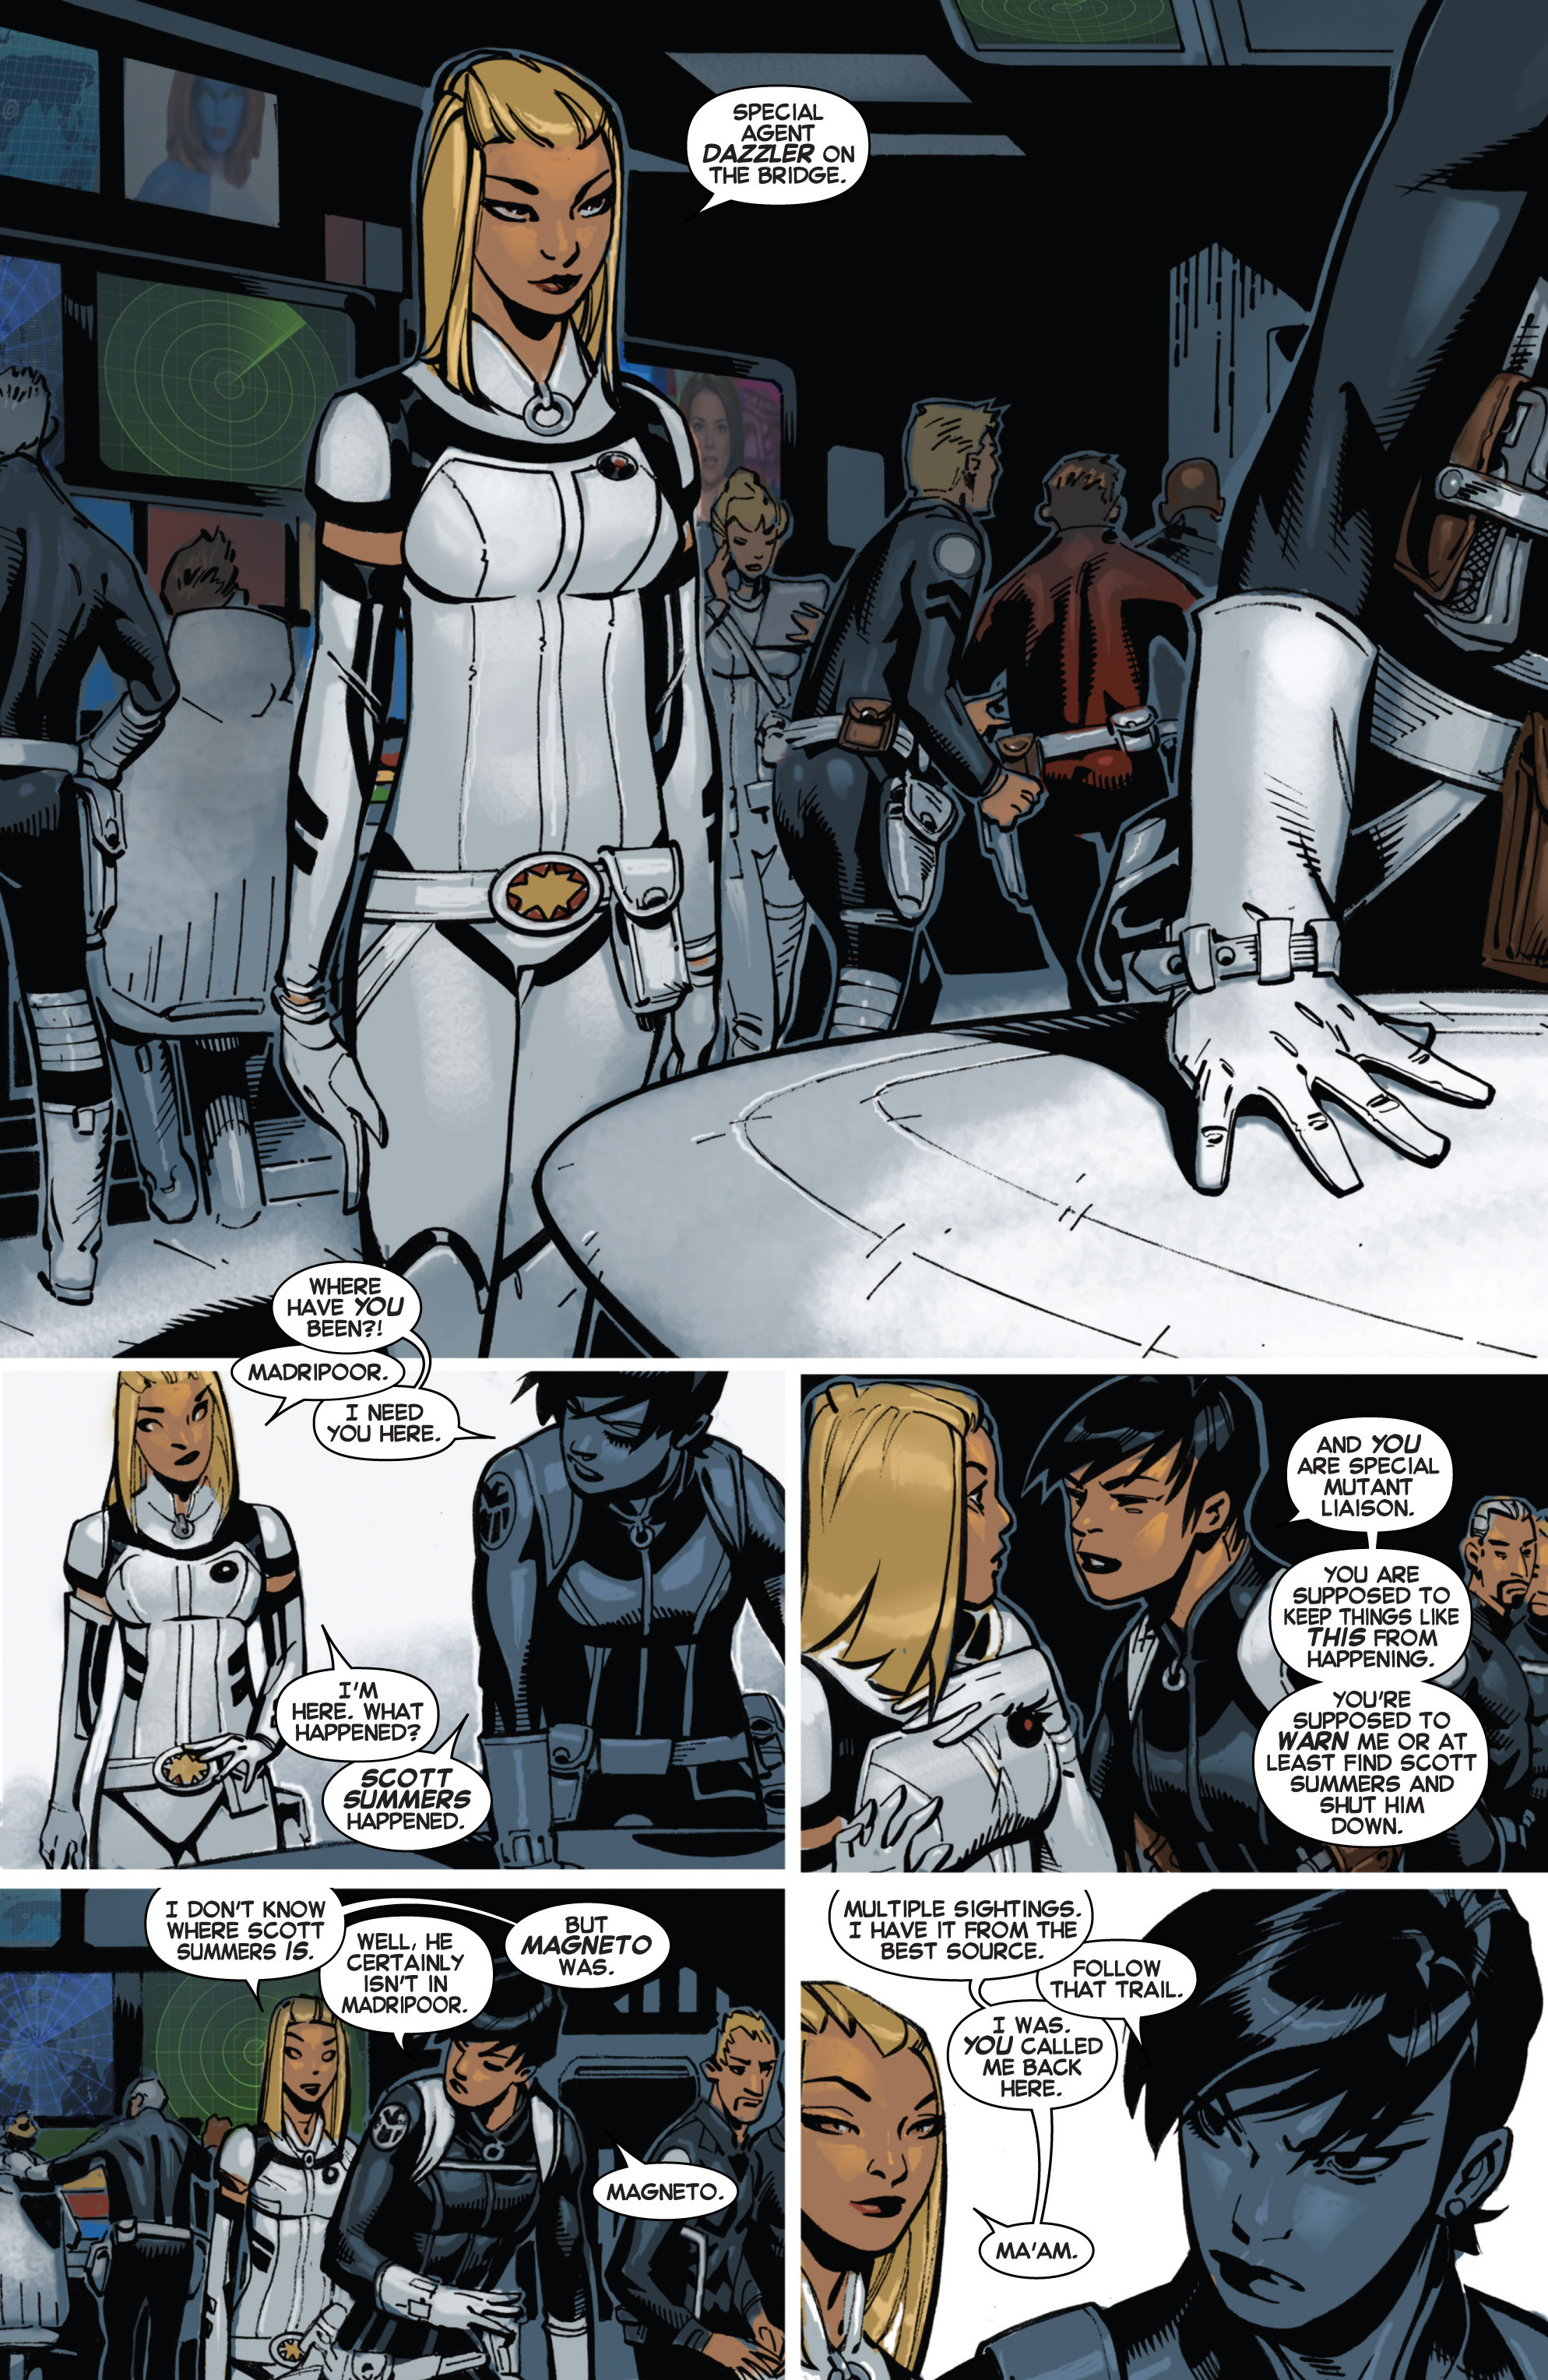 Read online Uncanny X-Men (2013) comic -  Issue # _TPB 4 - vs. S.H.I.E.L.D - 33